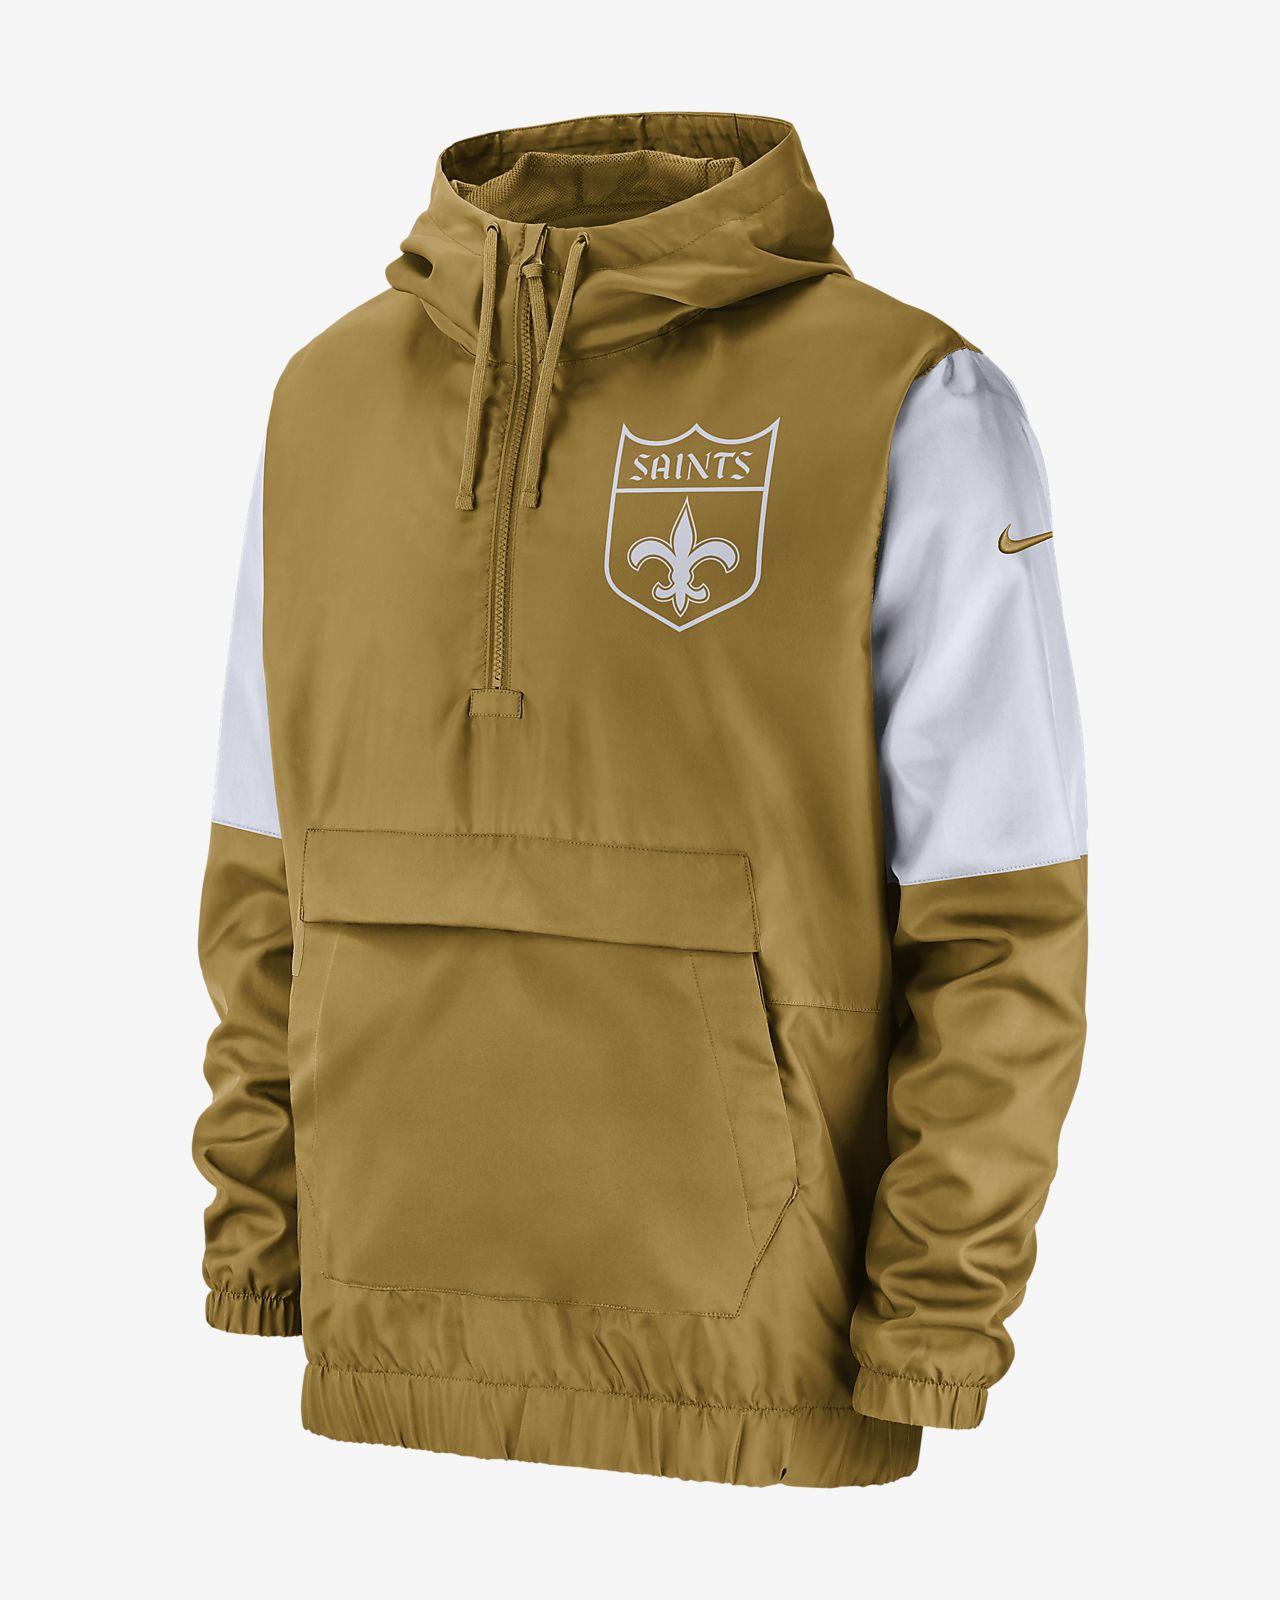 cheaper 12215 ffc1d Nike Anorak (NFL Saints) Men's Jacket